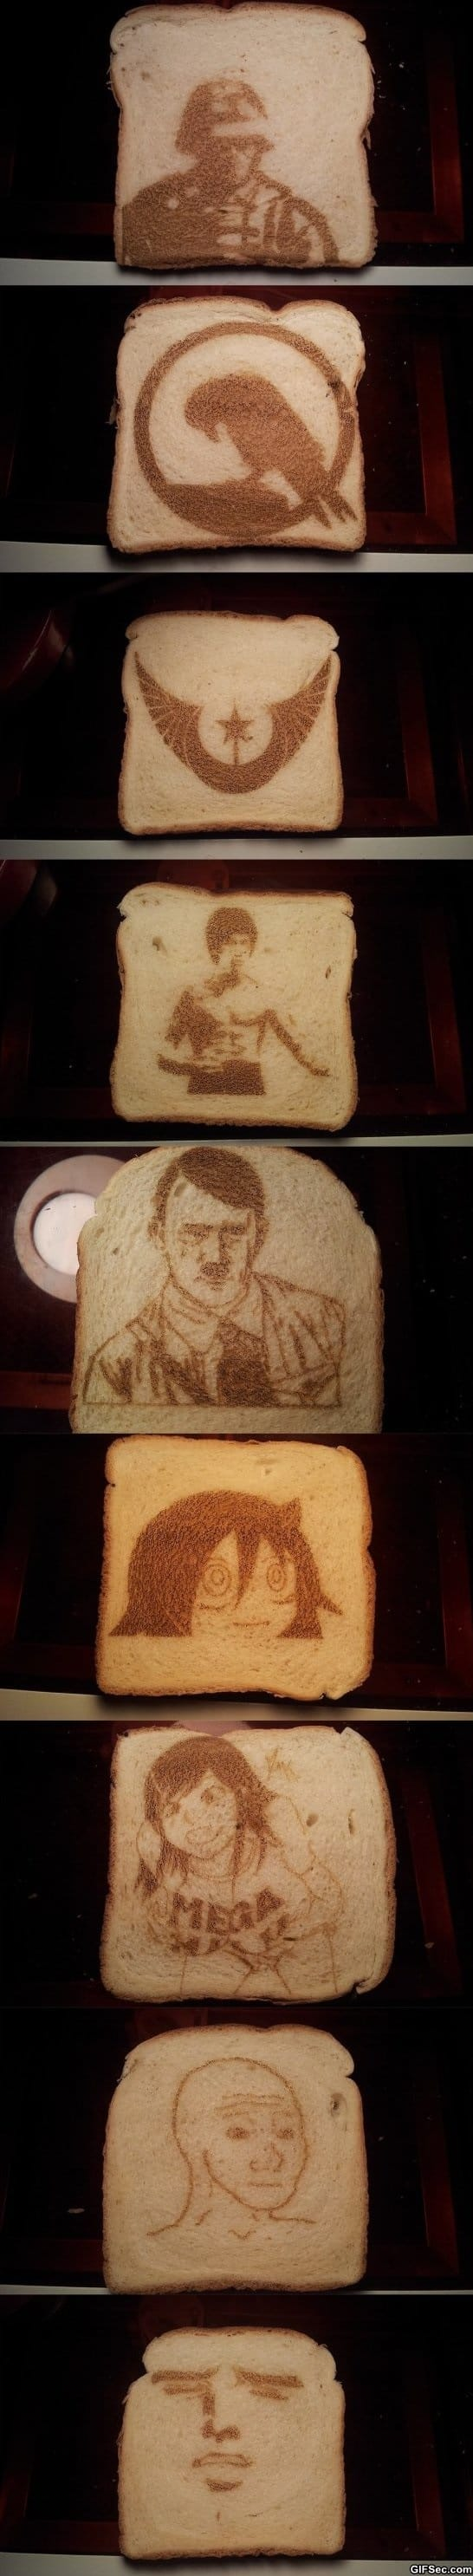 funny-pics-toasting-in-epic-bread-meme